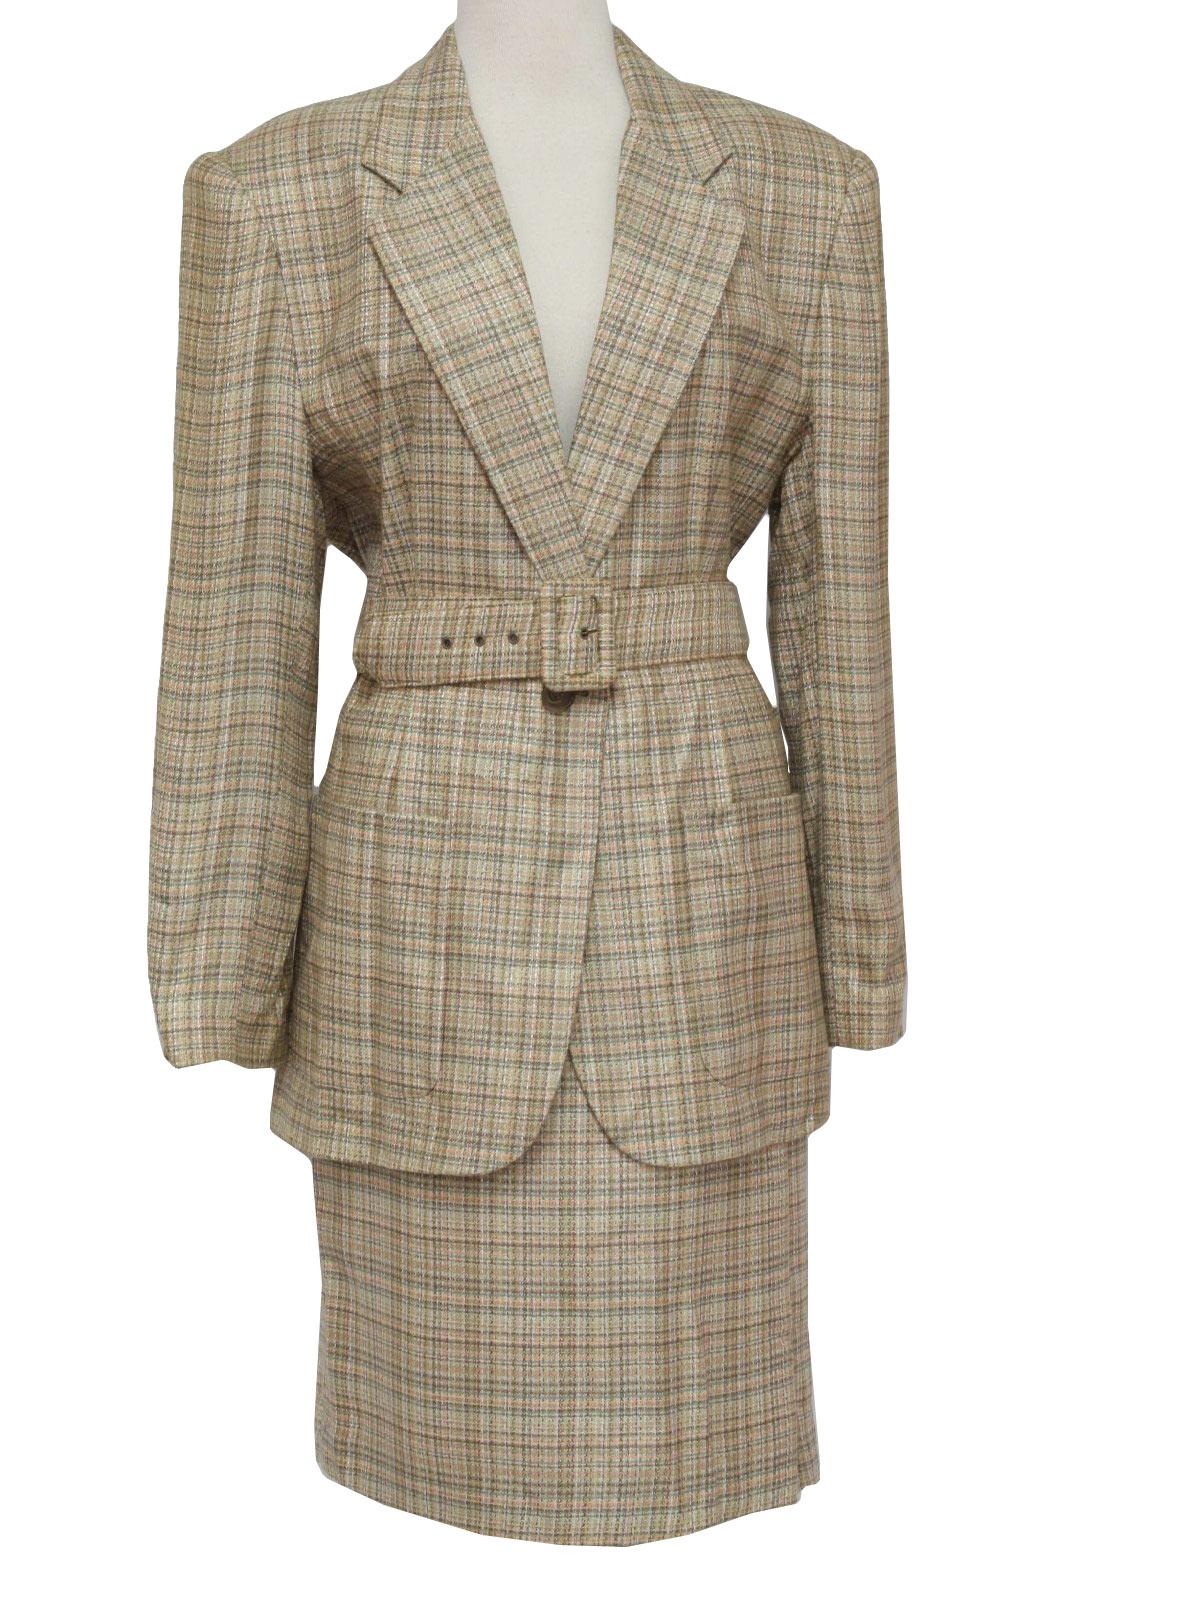 Eighties Vintage Suit 80s Rafael Womens Shaded Cream